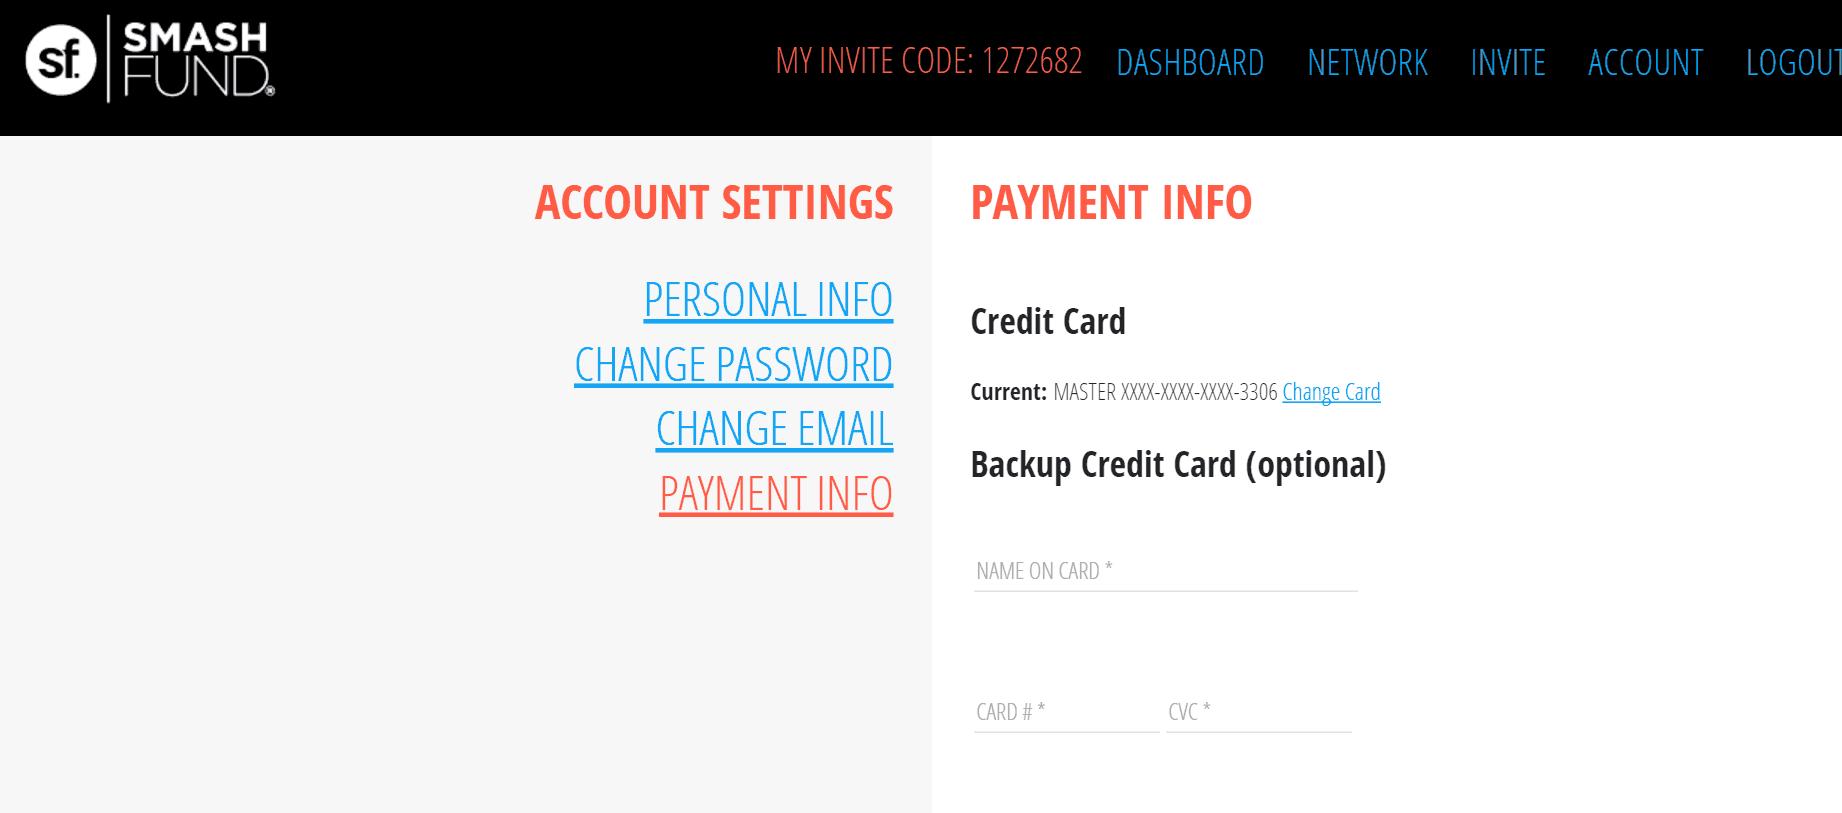 Smashfund Account